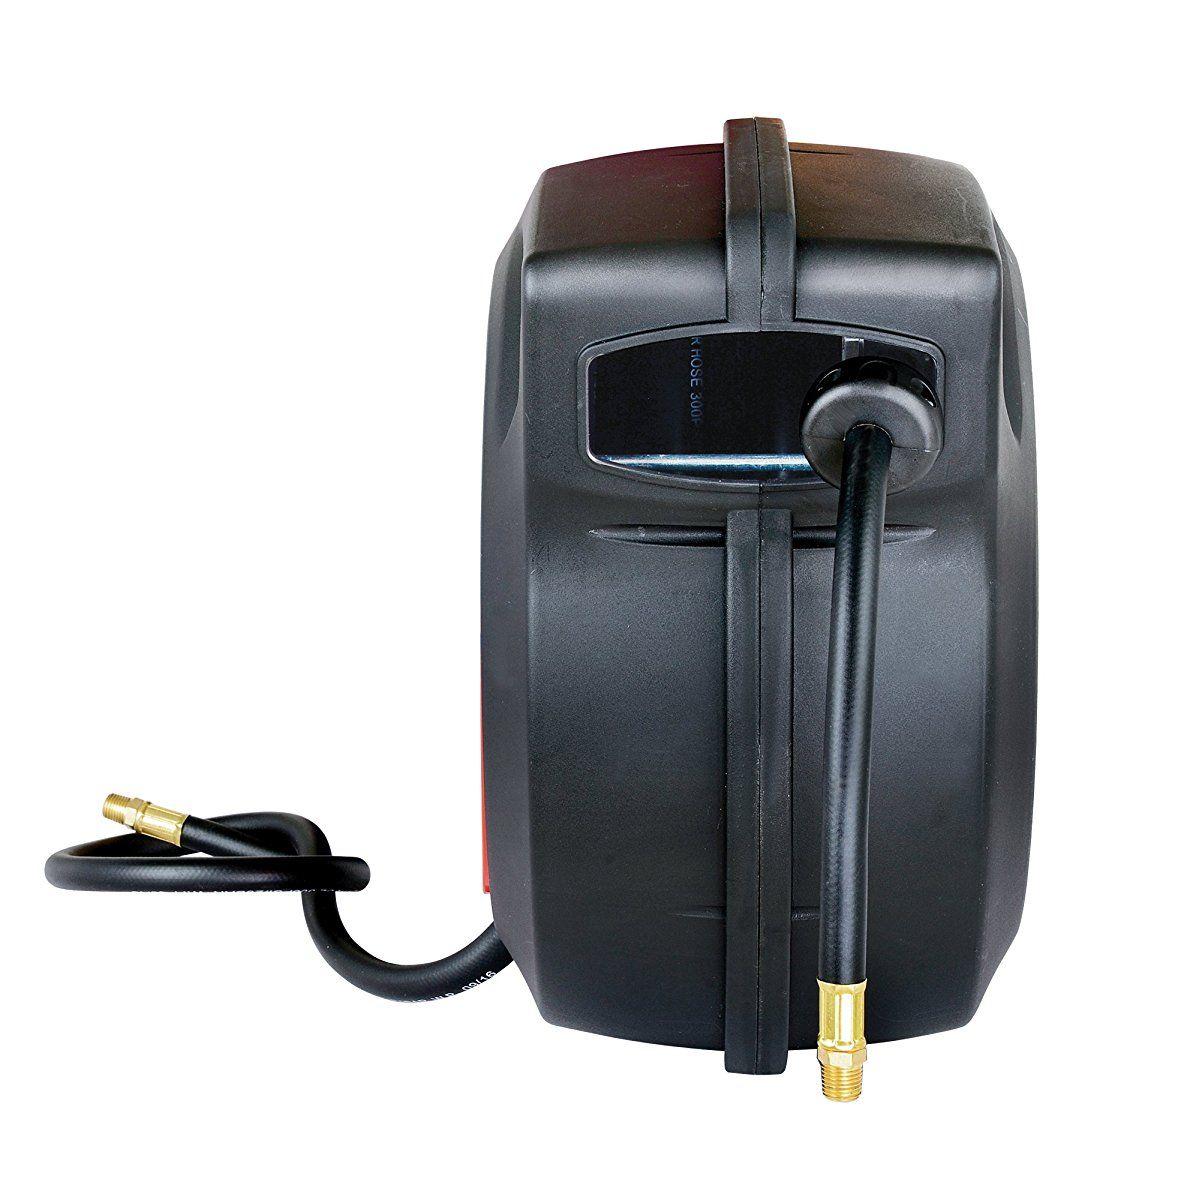 "REELWORKS Plastic Retractable Air Hose Reel 3//8/"" x 50/' Polymer Hose"